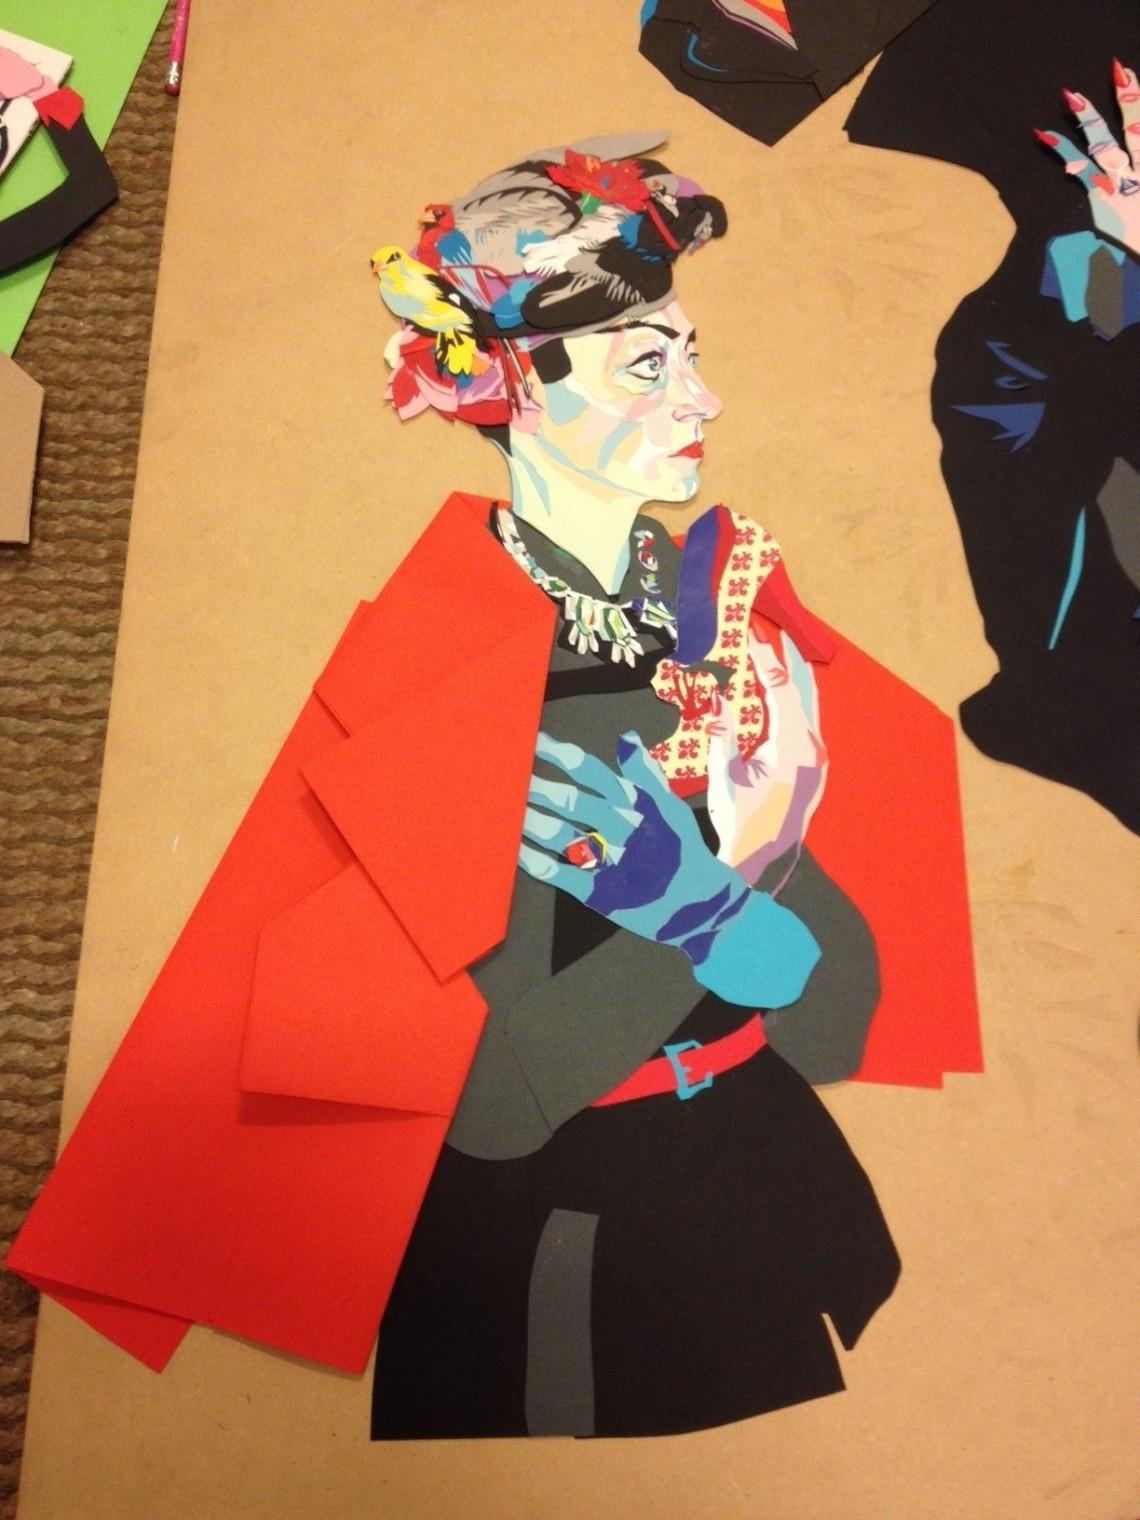 Francesco Merletti, untitled, tissue paper collage, 2013